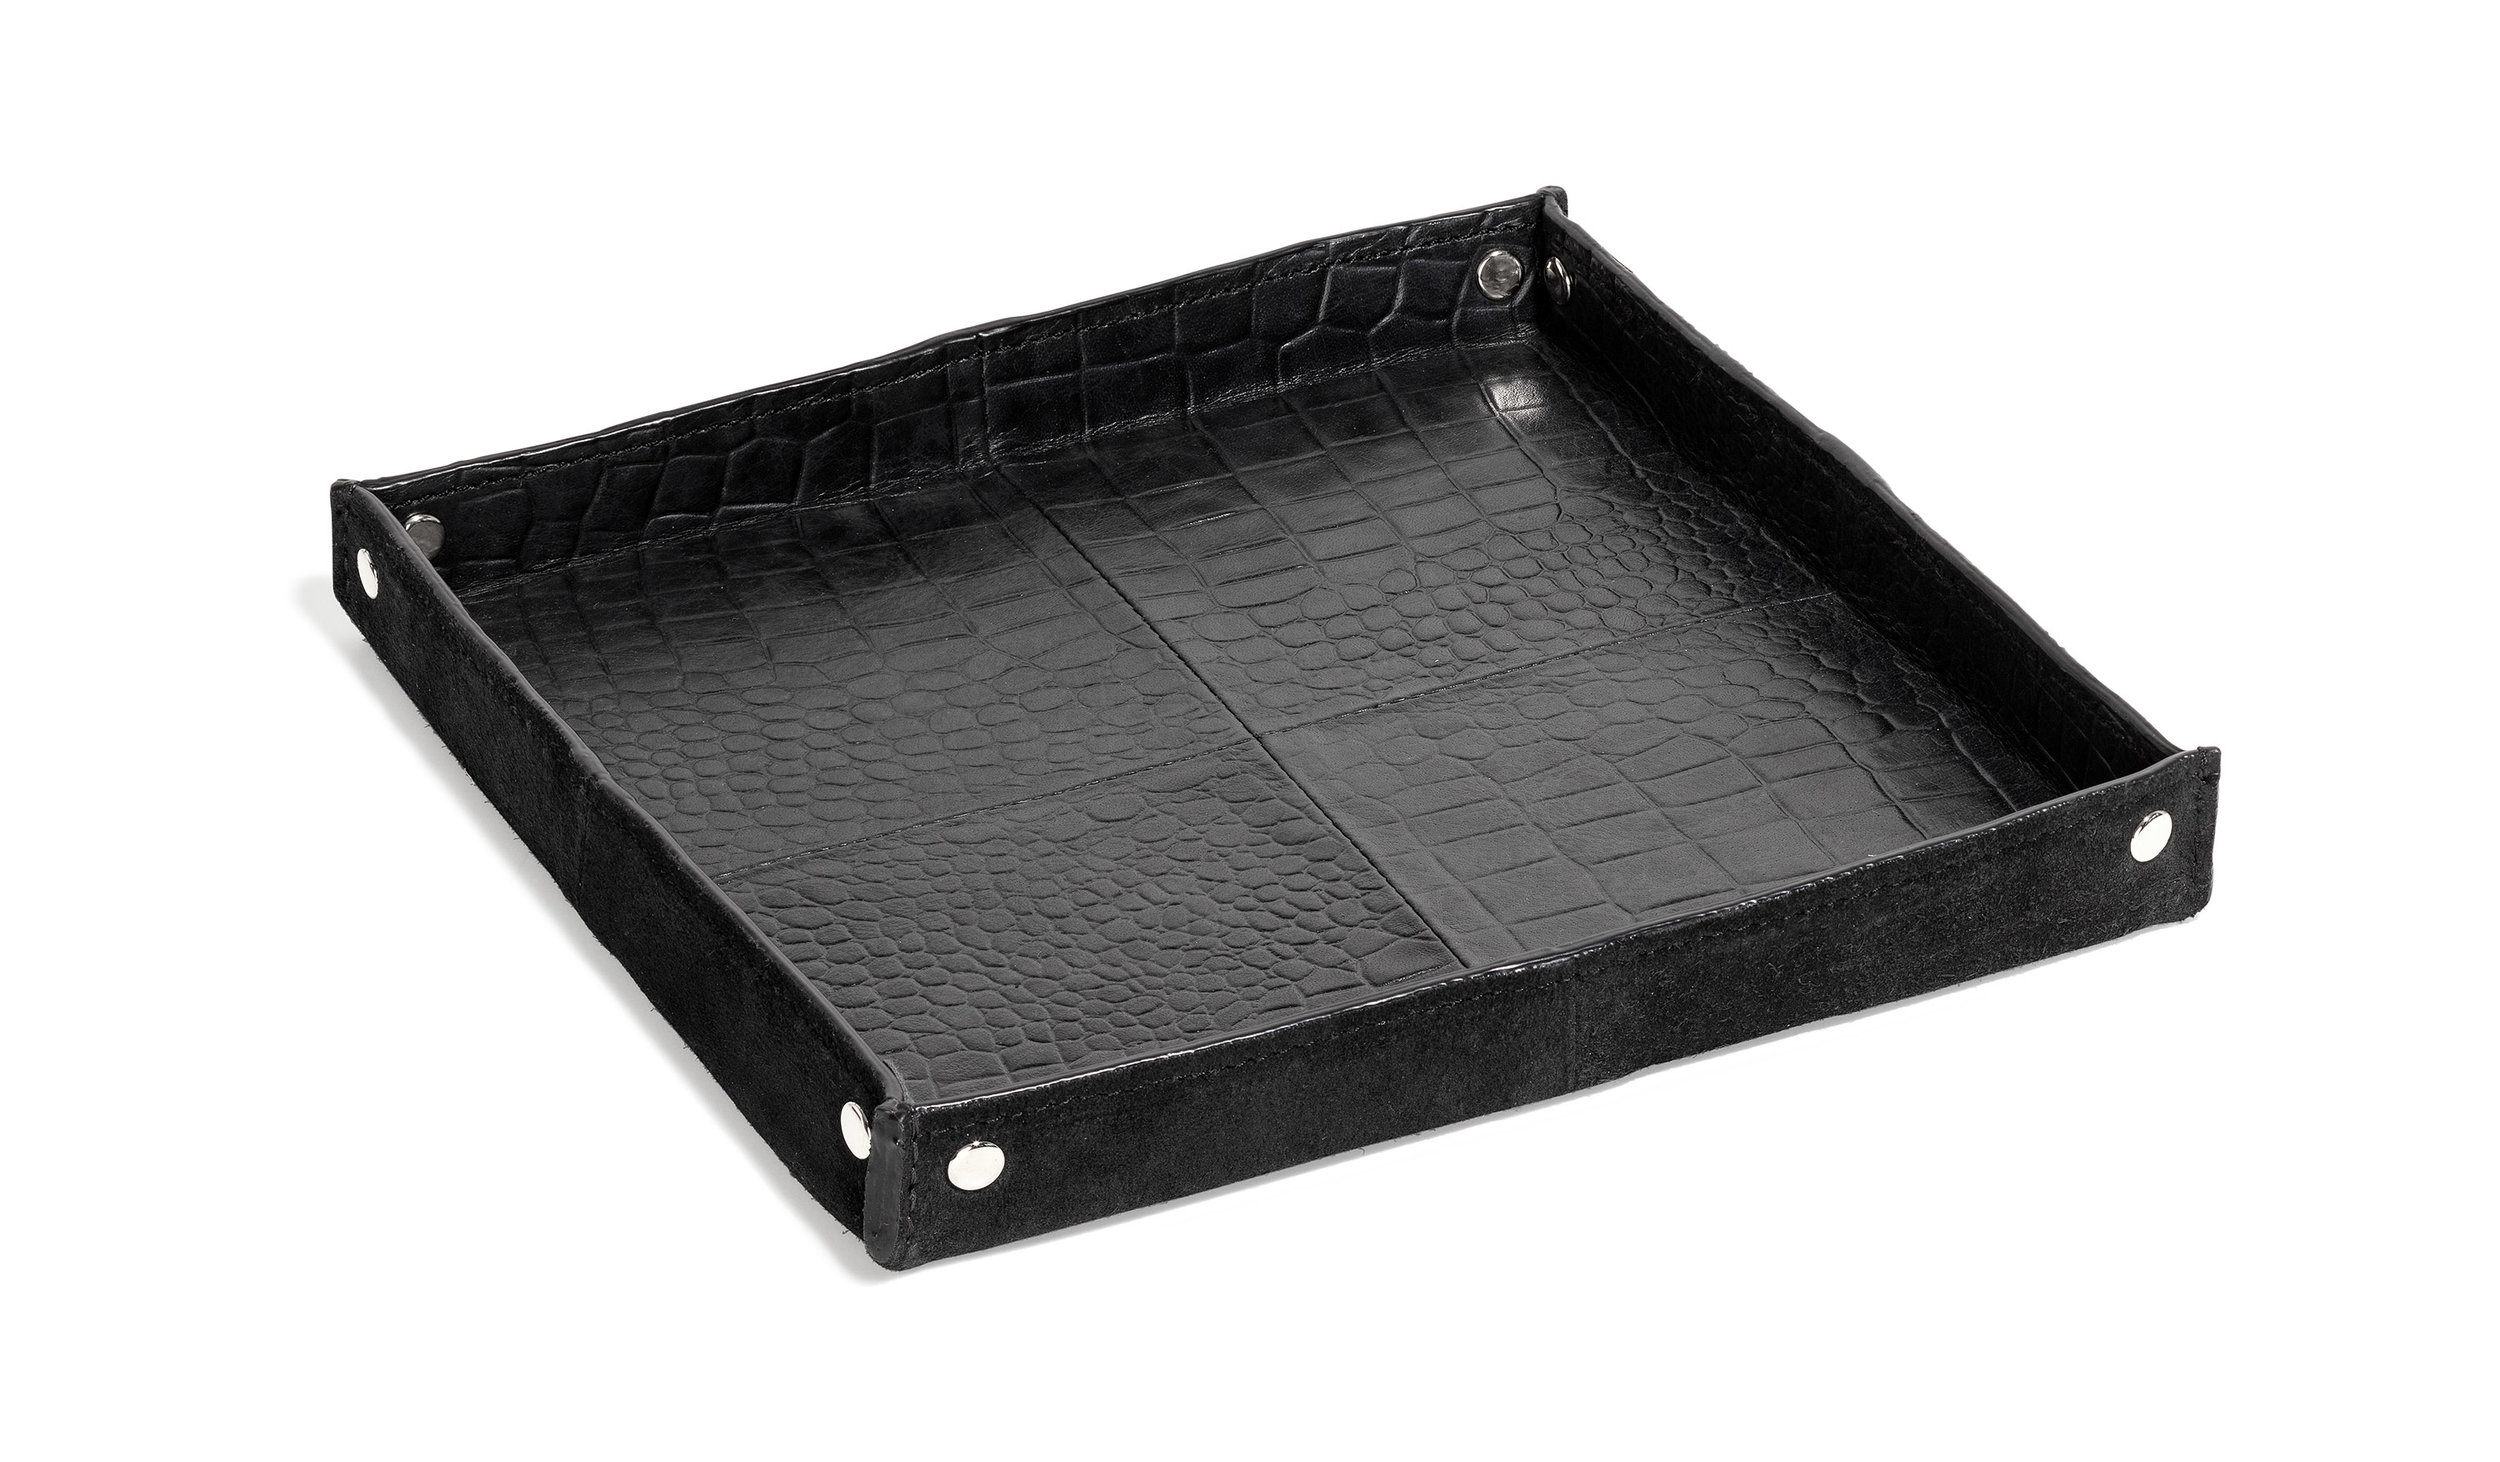 Harris tray croco black leather 24x24